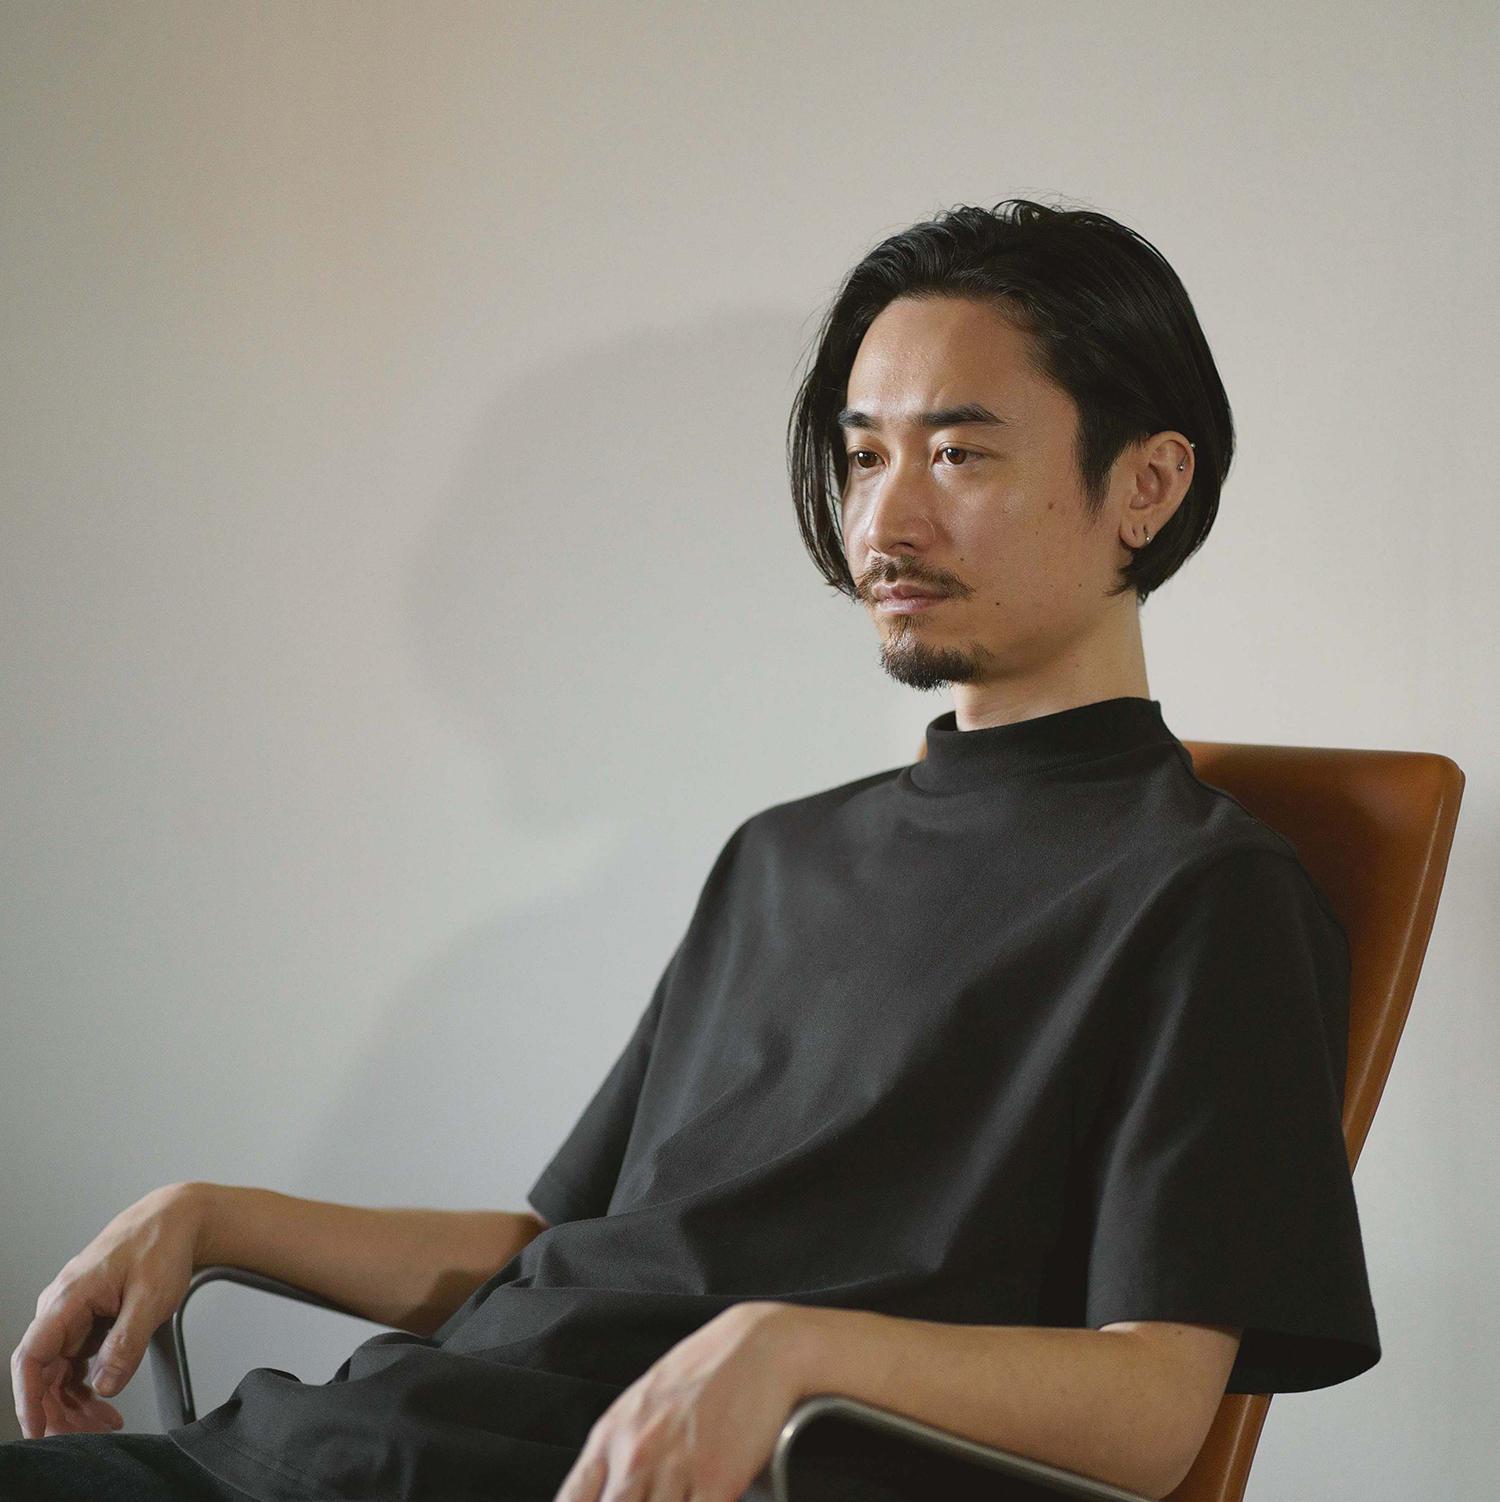 Shōtaro Aoyama_Lowres.jpg